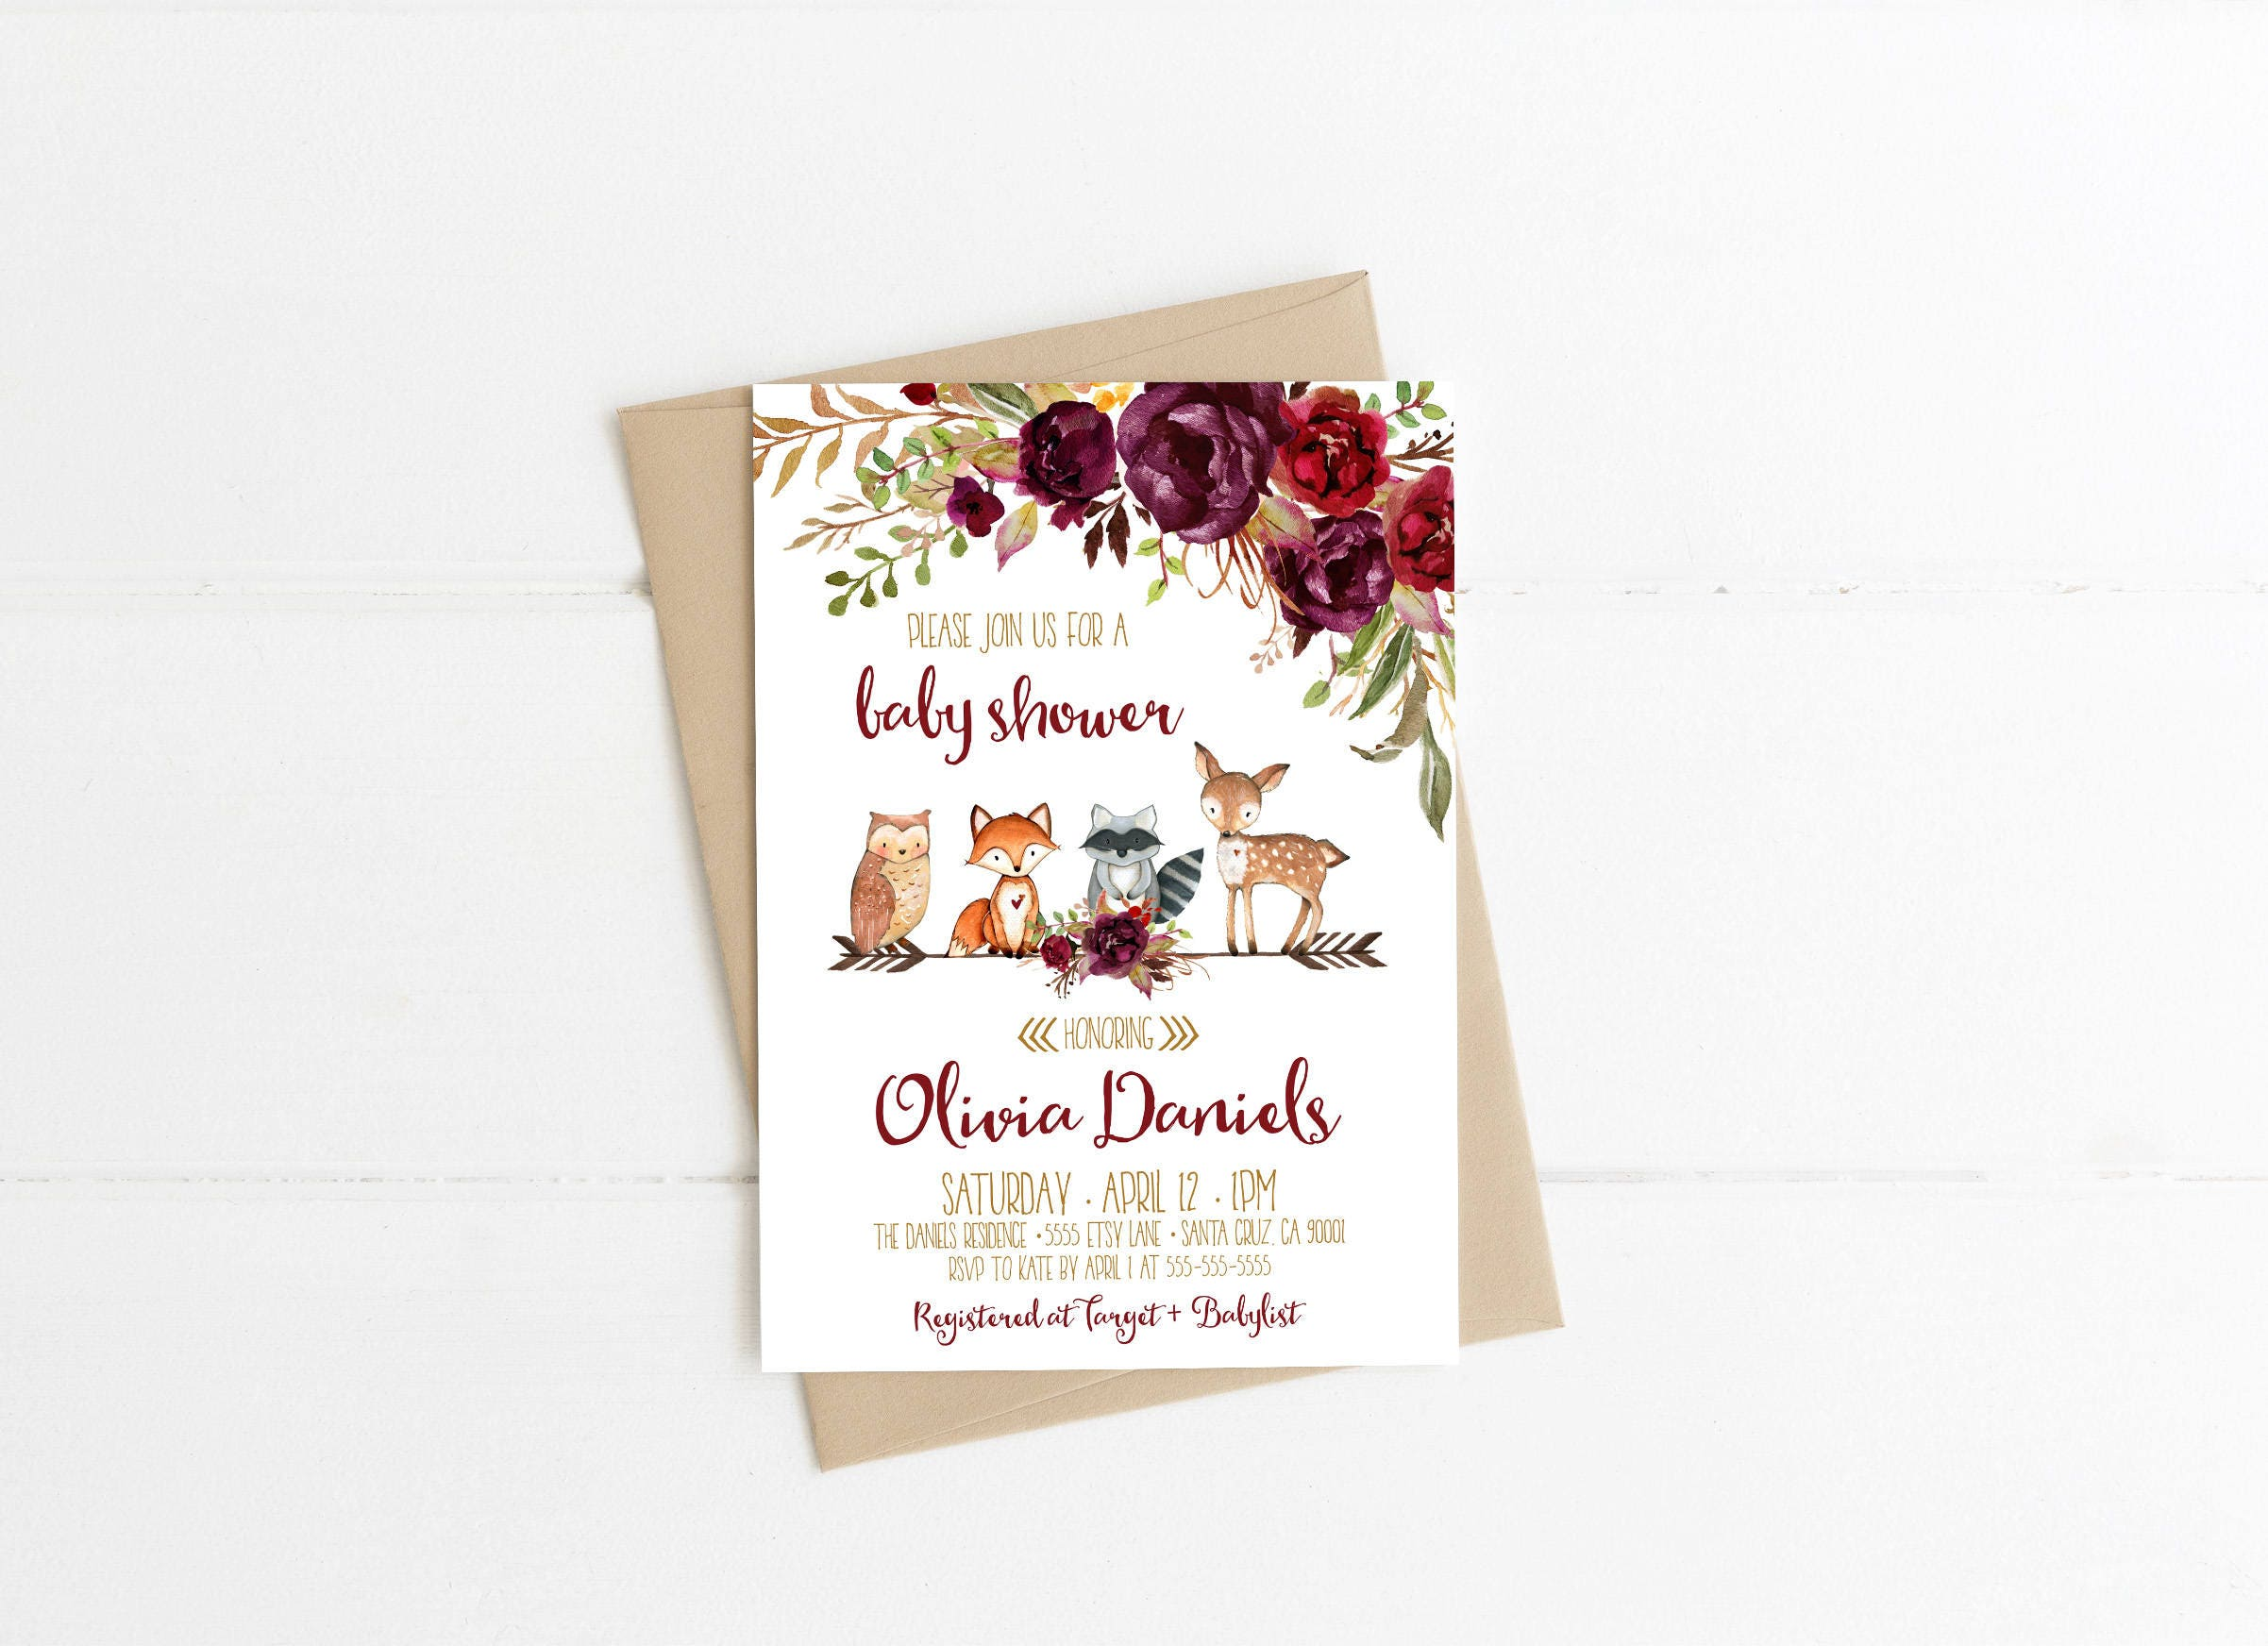 Woodland baby shower invitations Autumn Fall invitation